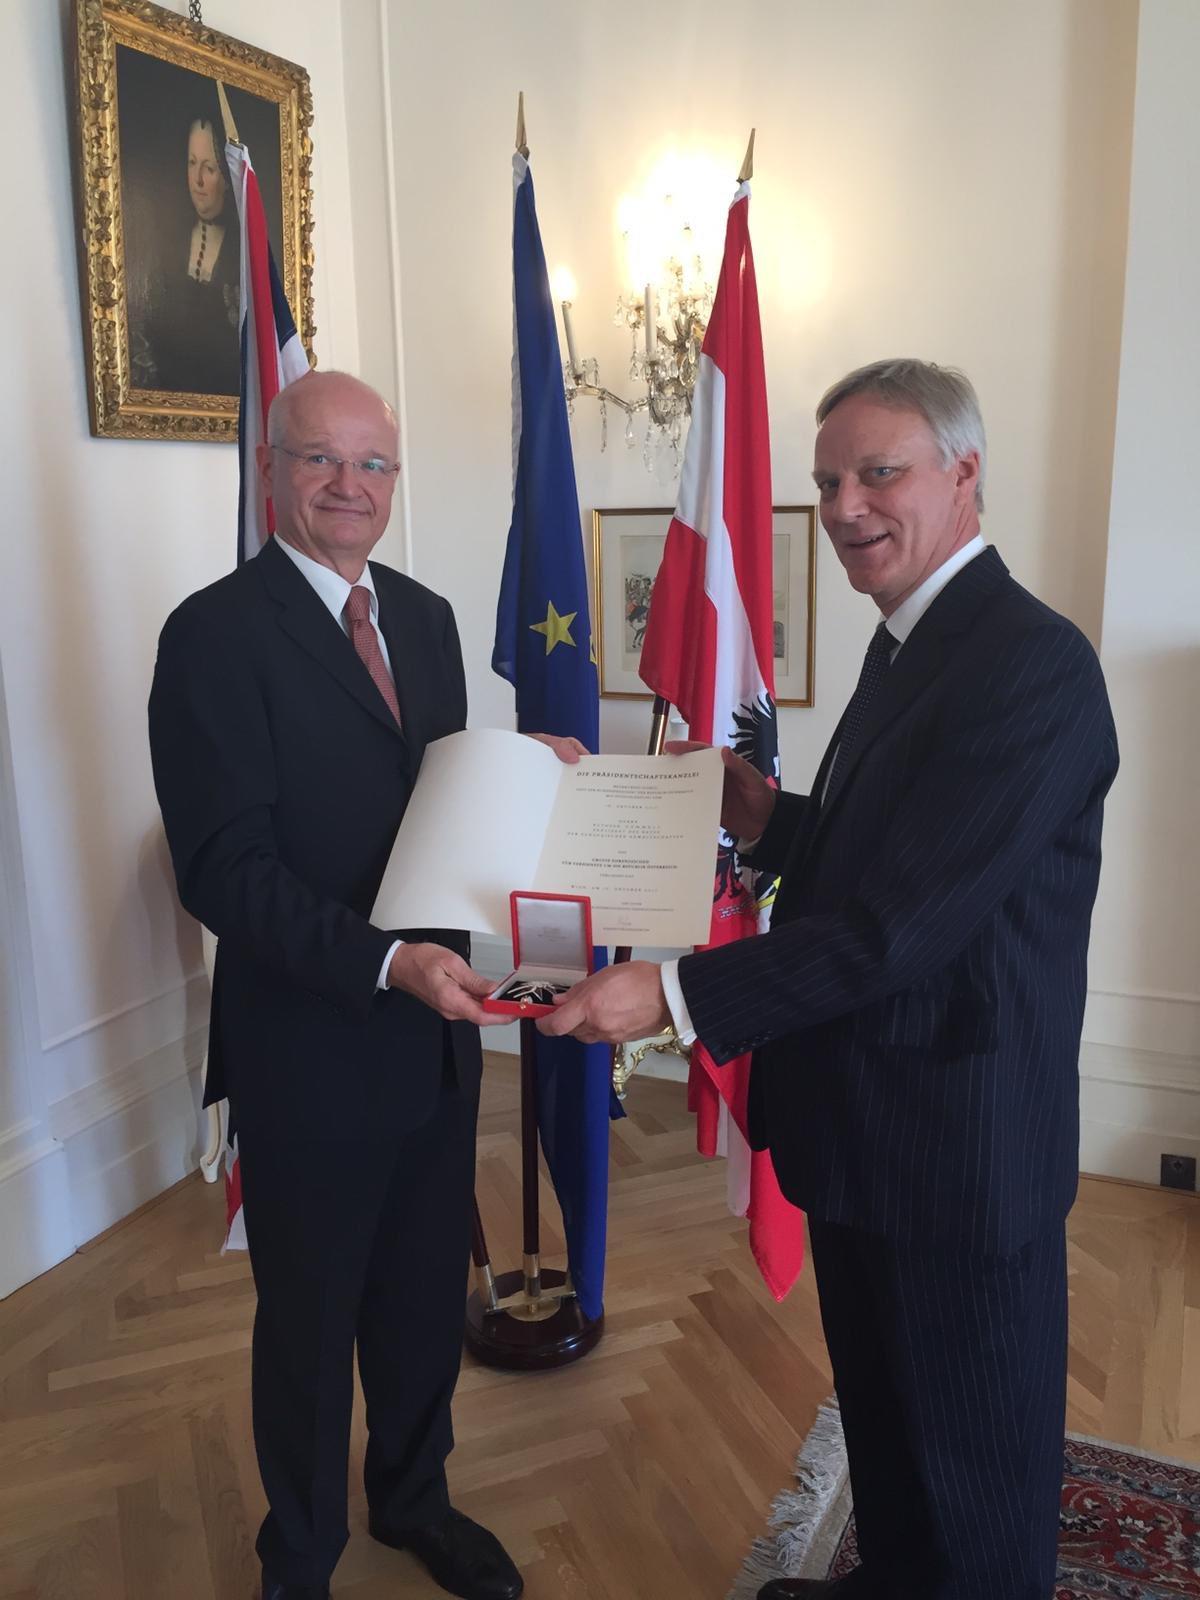 Murray Beith Murray Partner, Ruthven Gemmell, is honoured